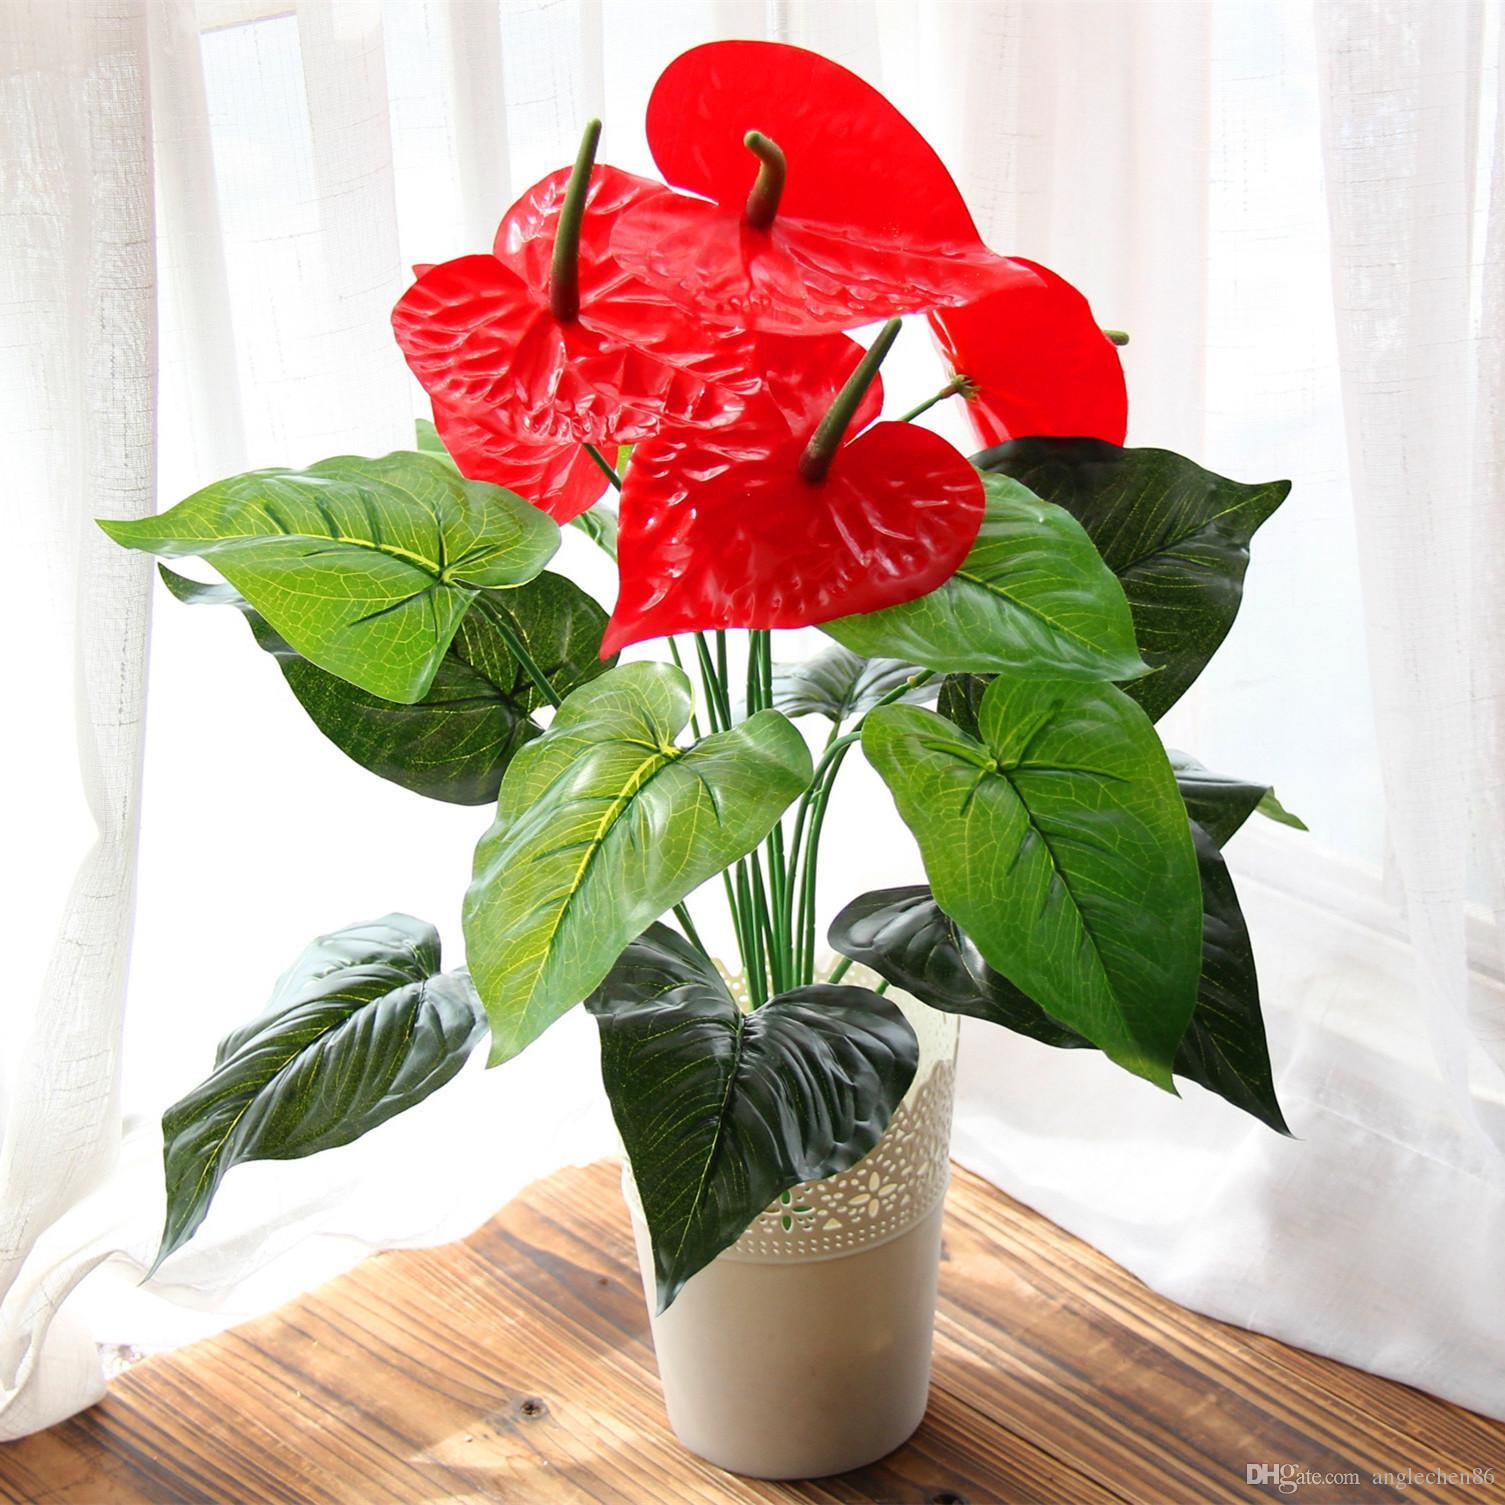 Best Great 18 Heads Artificial Flower Small Potted Plant Silk Suit Potted Anthurium fice Home Garden Decoration Bonsai Wholesale Under $5 03